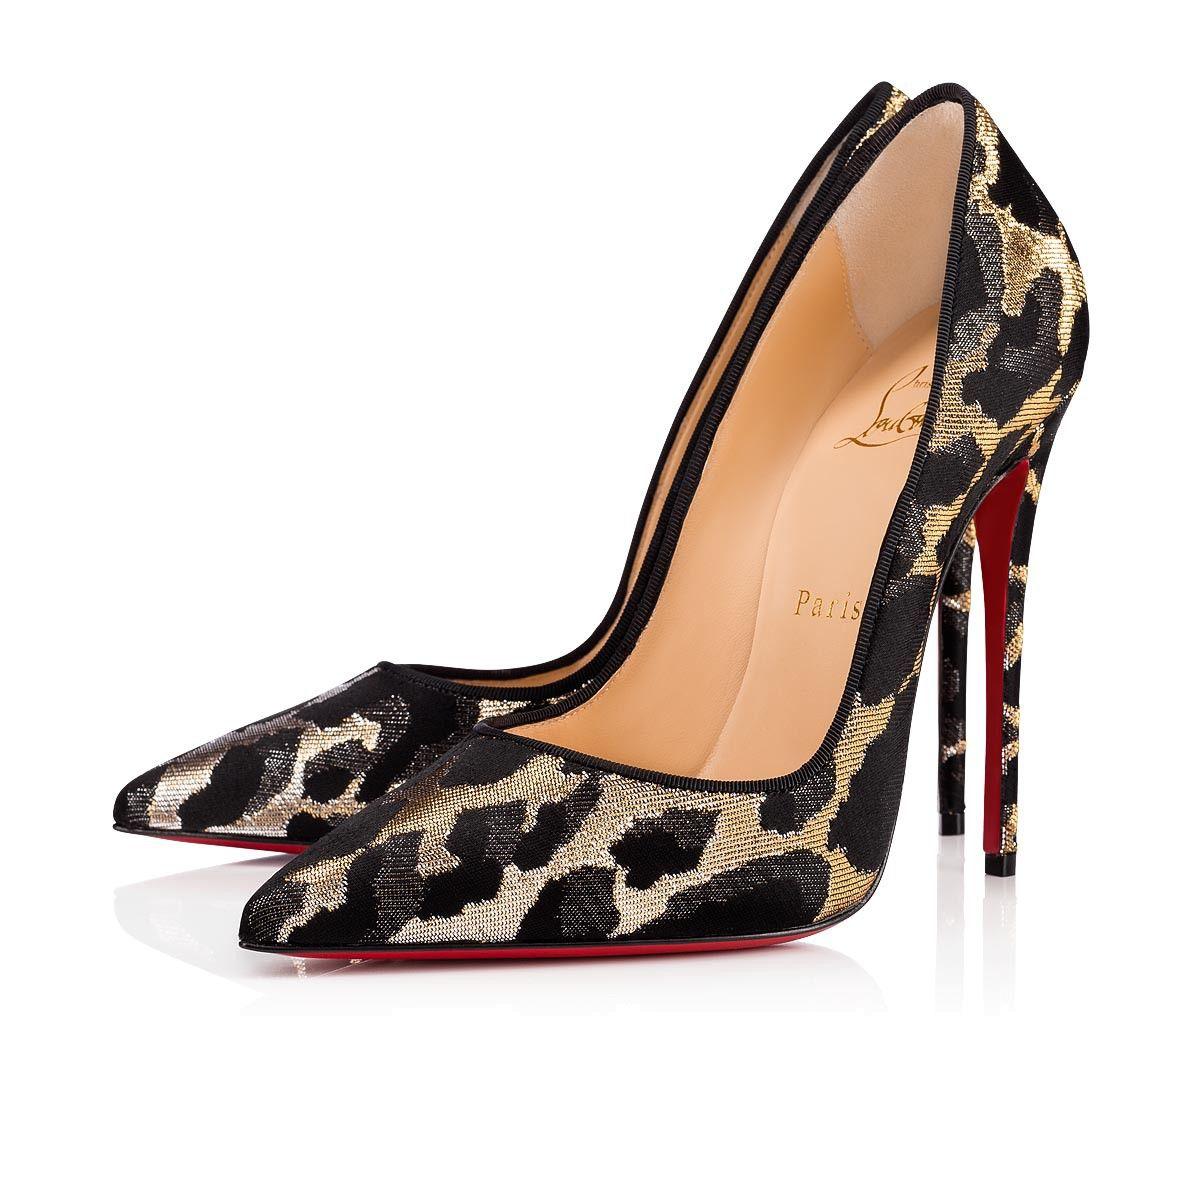 a387be49ec0 So Kate 120 Black-Gold/Black Lurex Feline - Women Shoes - Christian ...